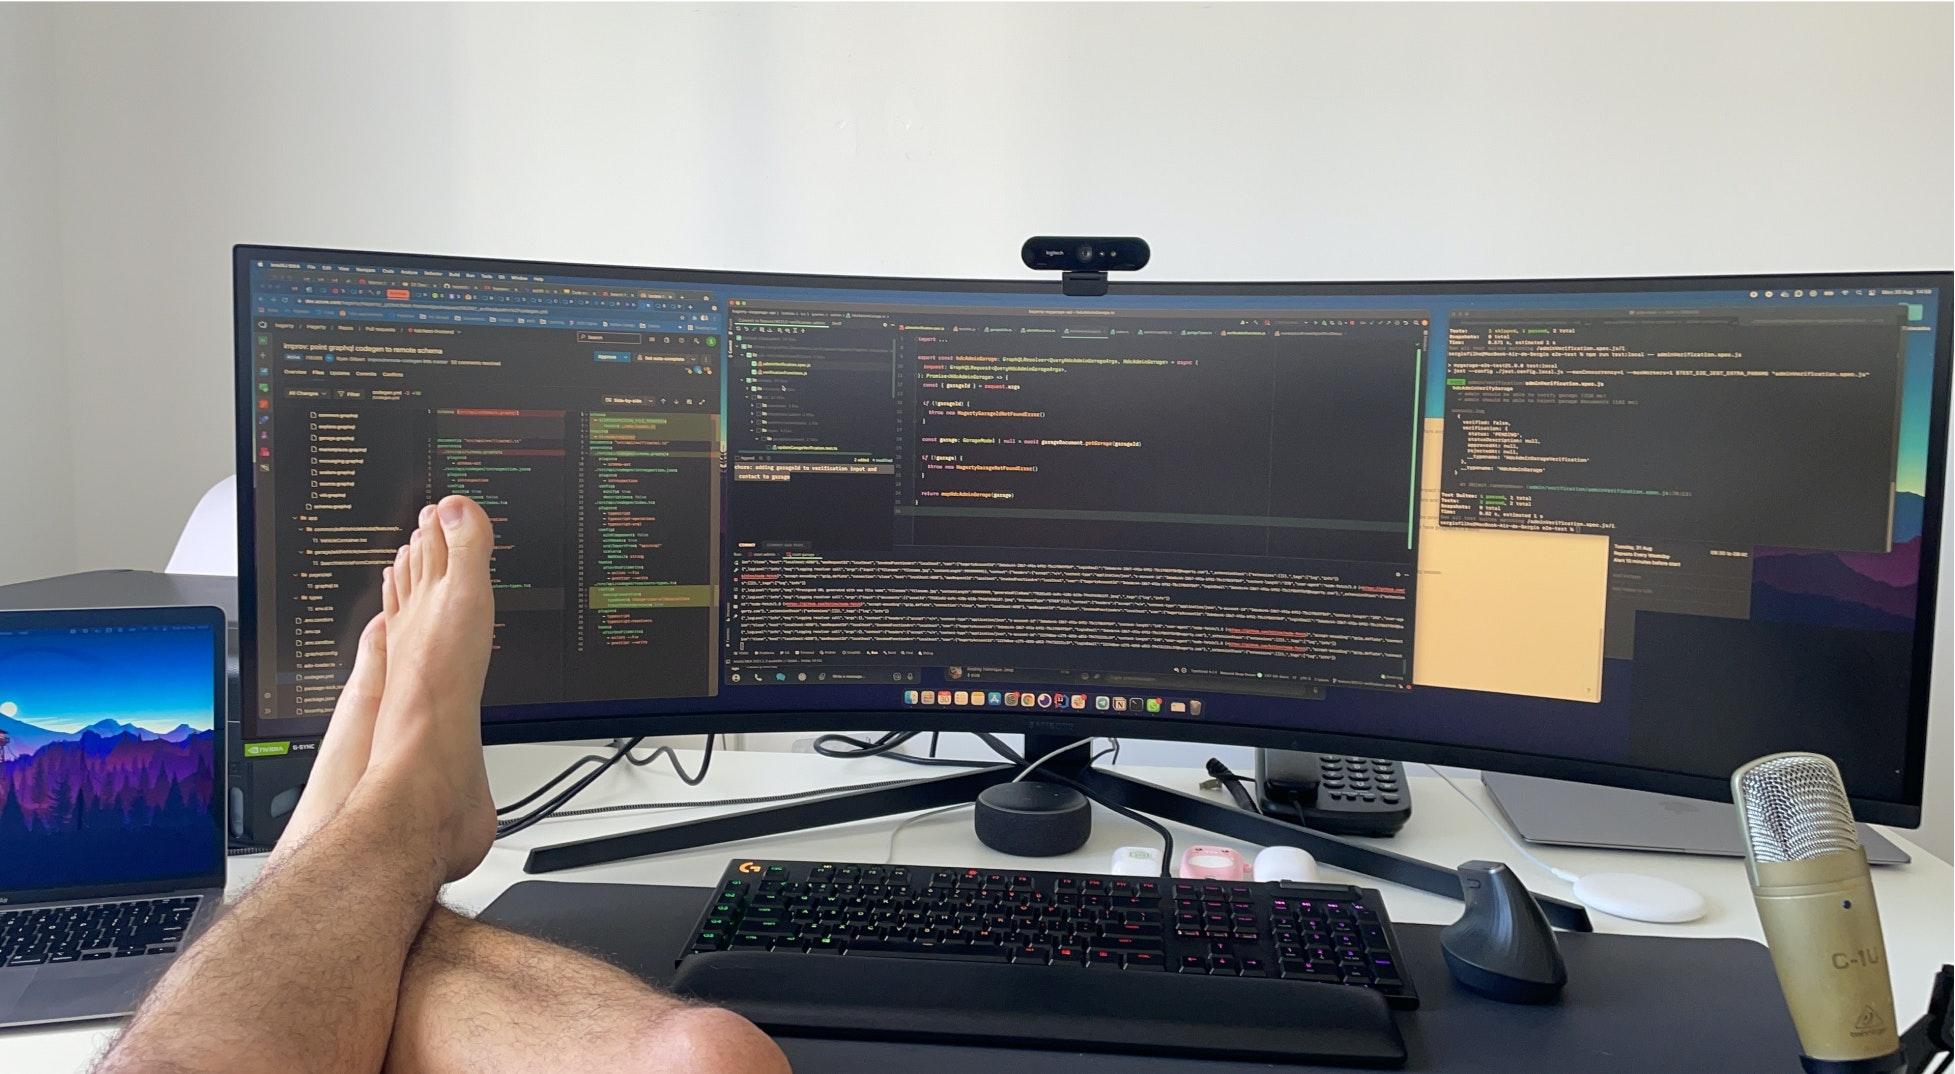 Feet up on a desk.